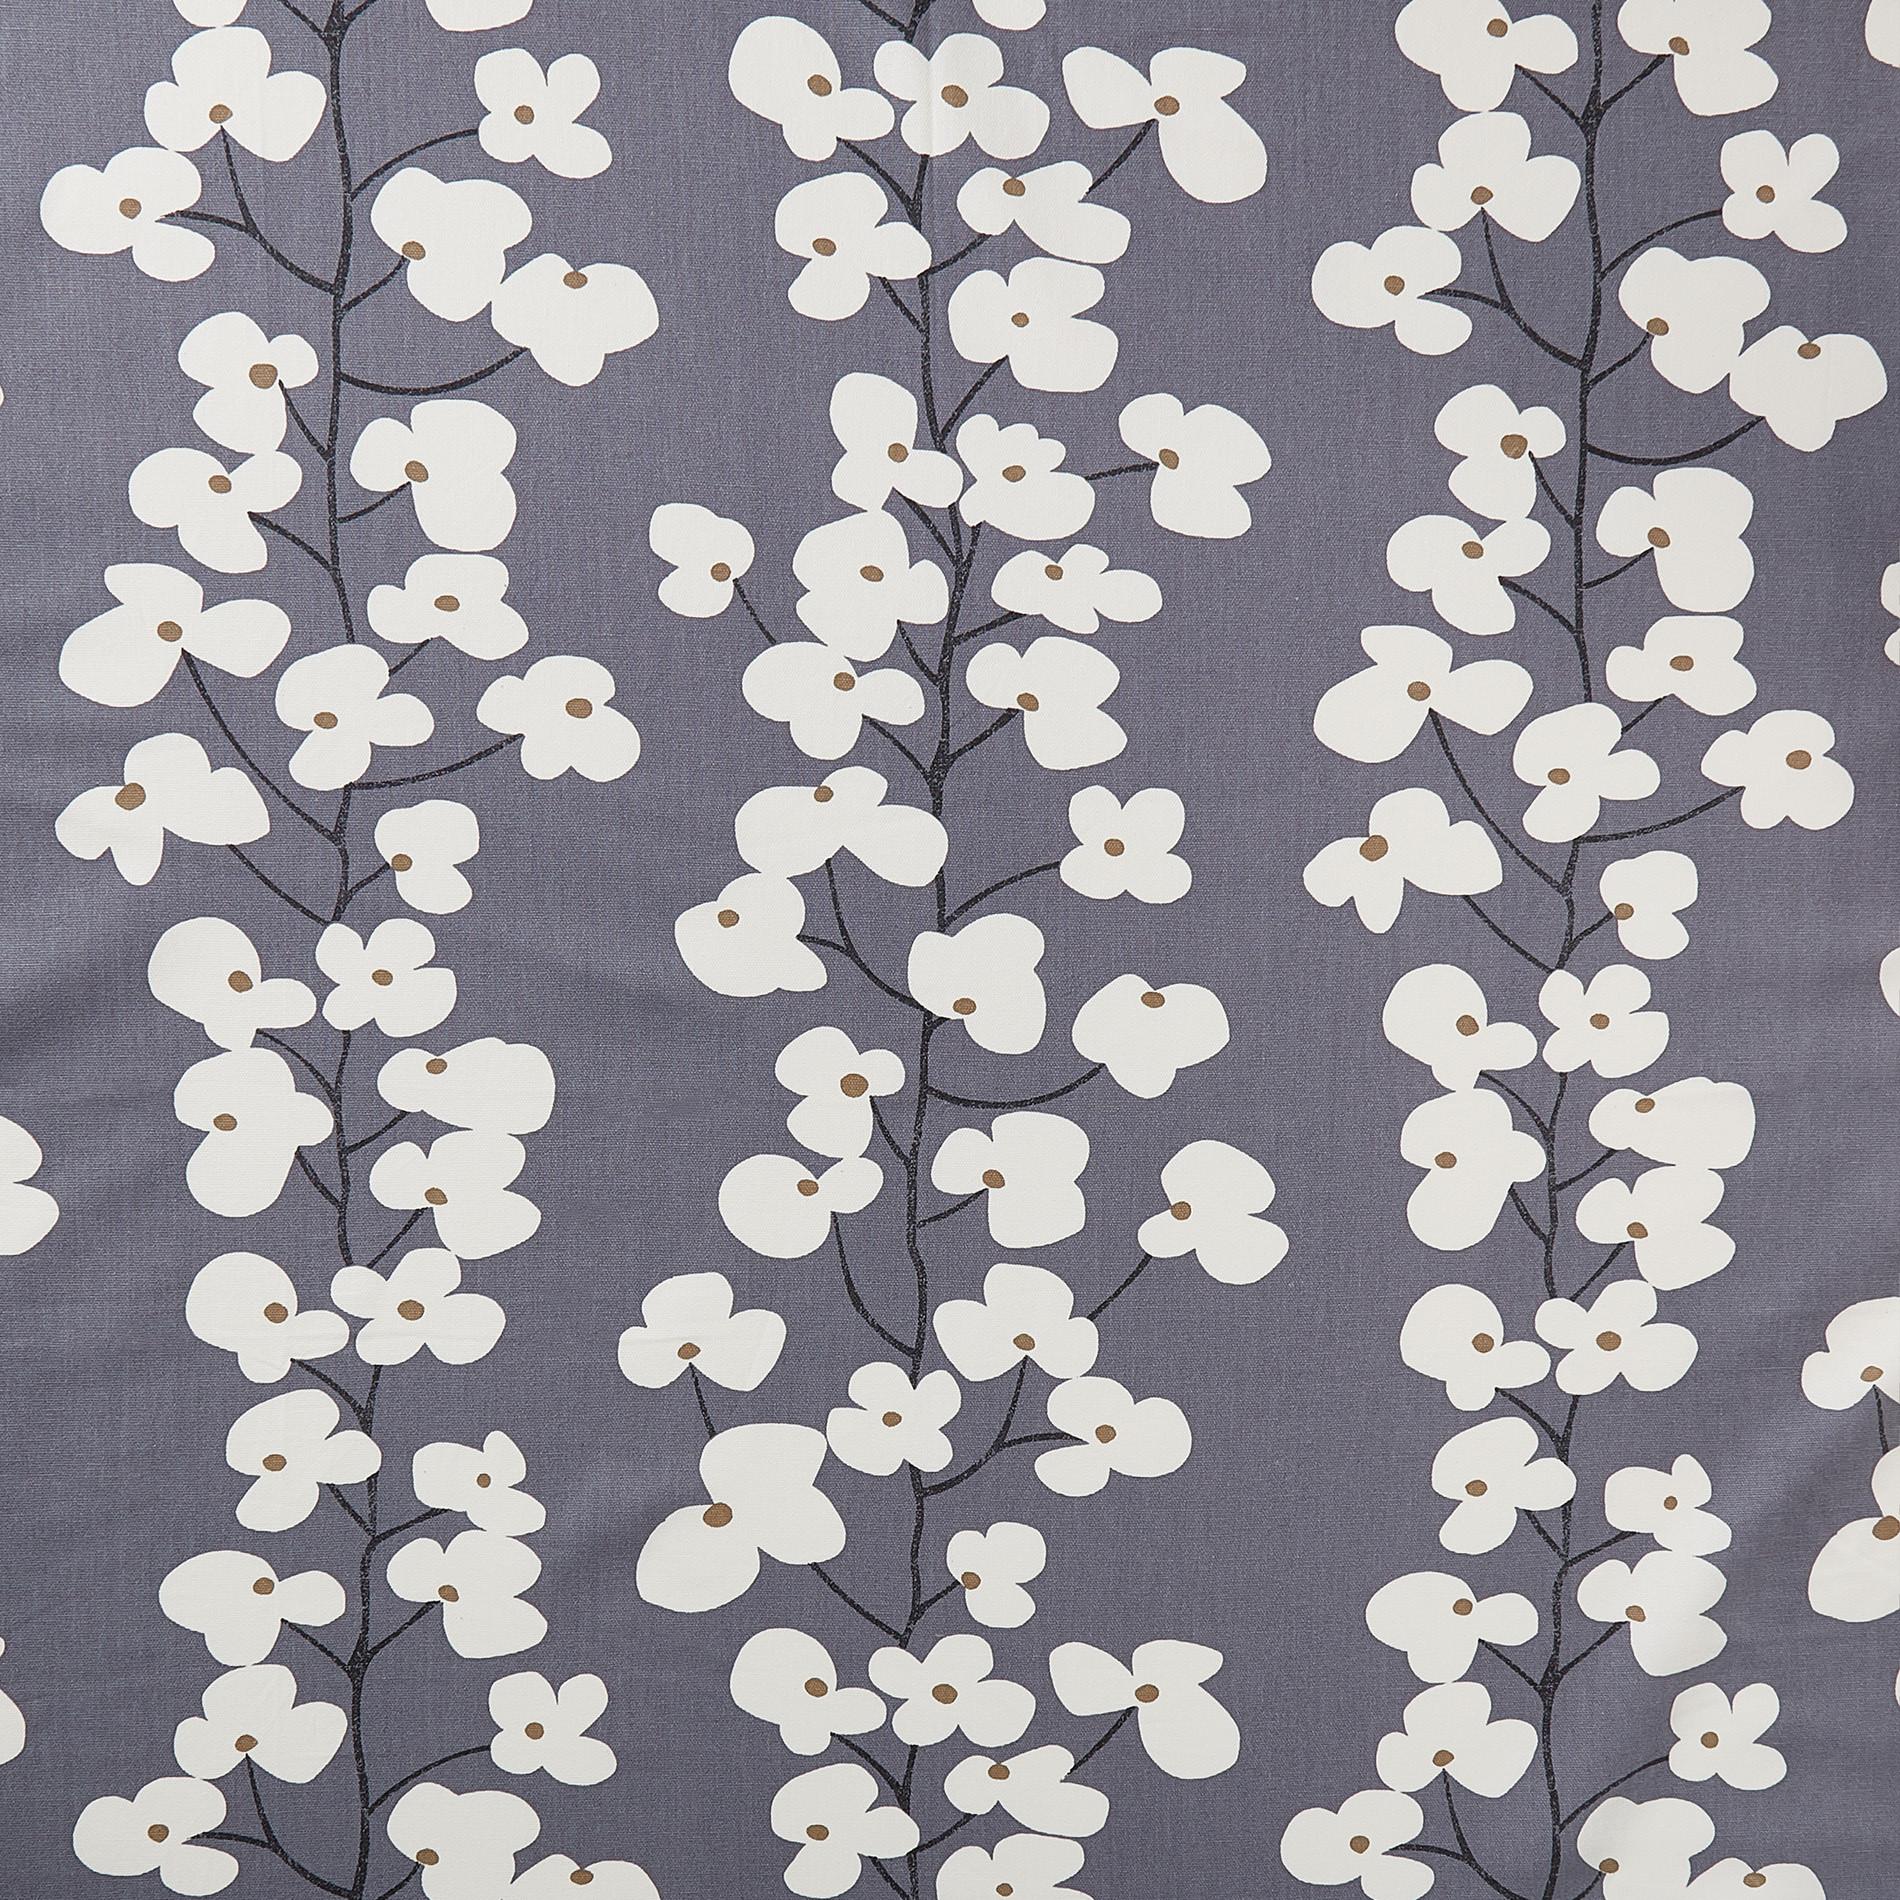 Tovaglia cotone stampa fiori, Bianco/Blu, large image number 1